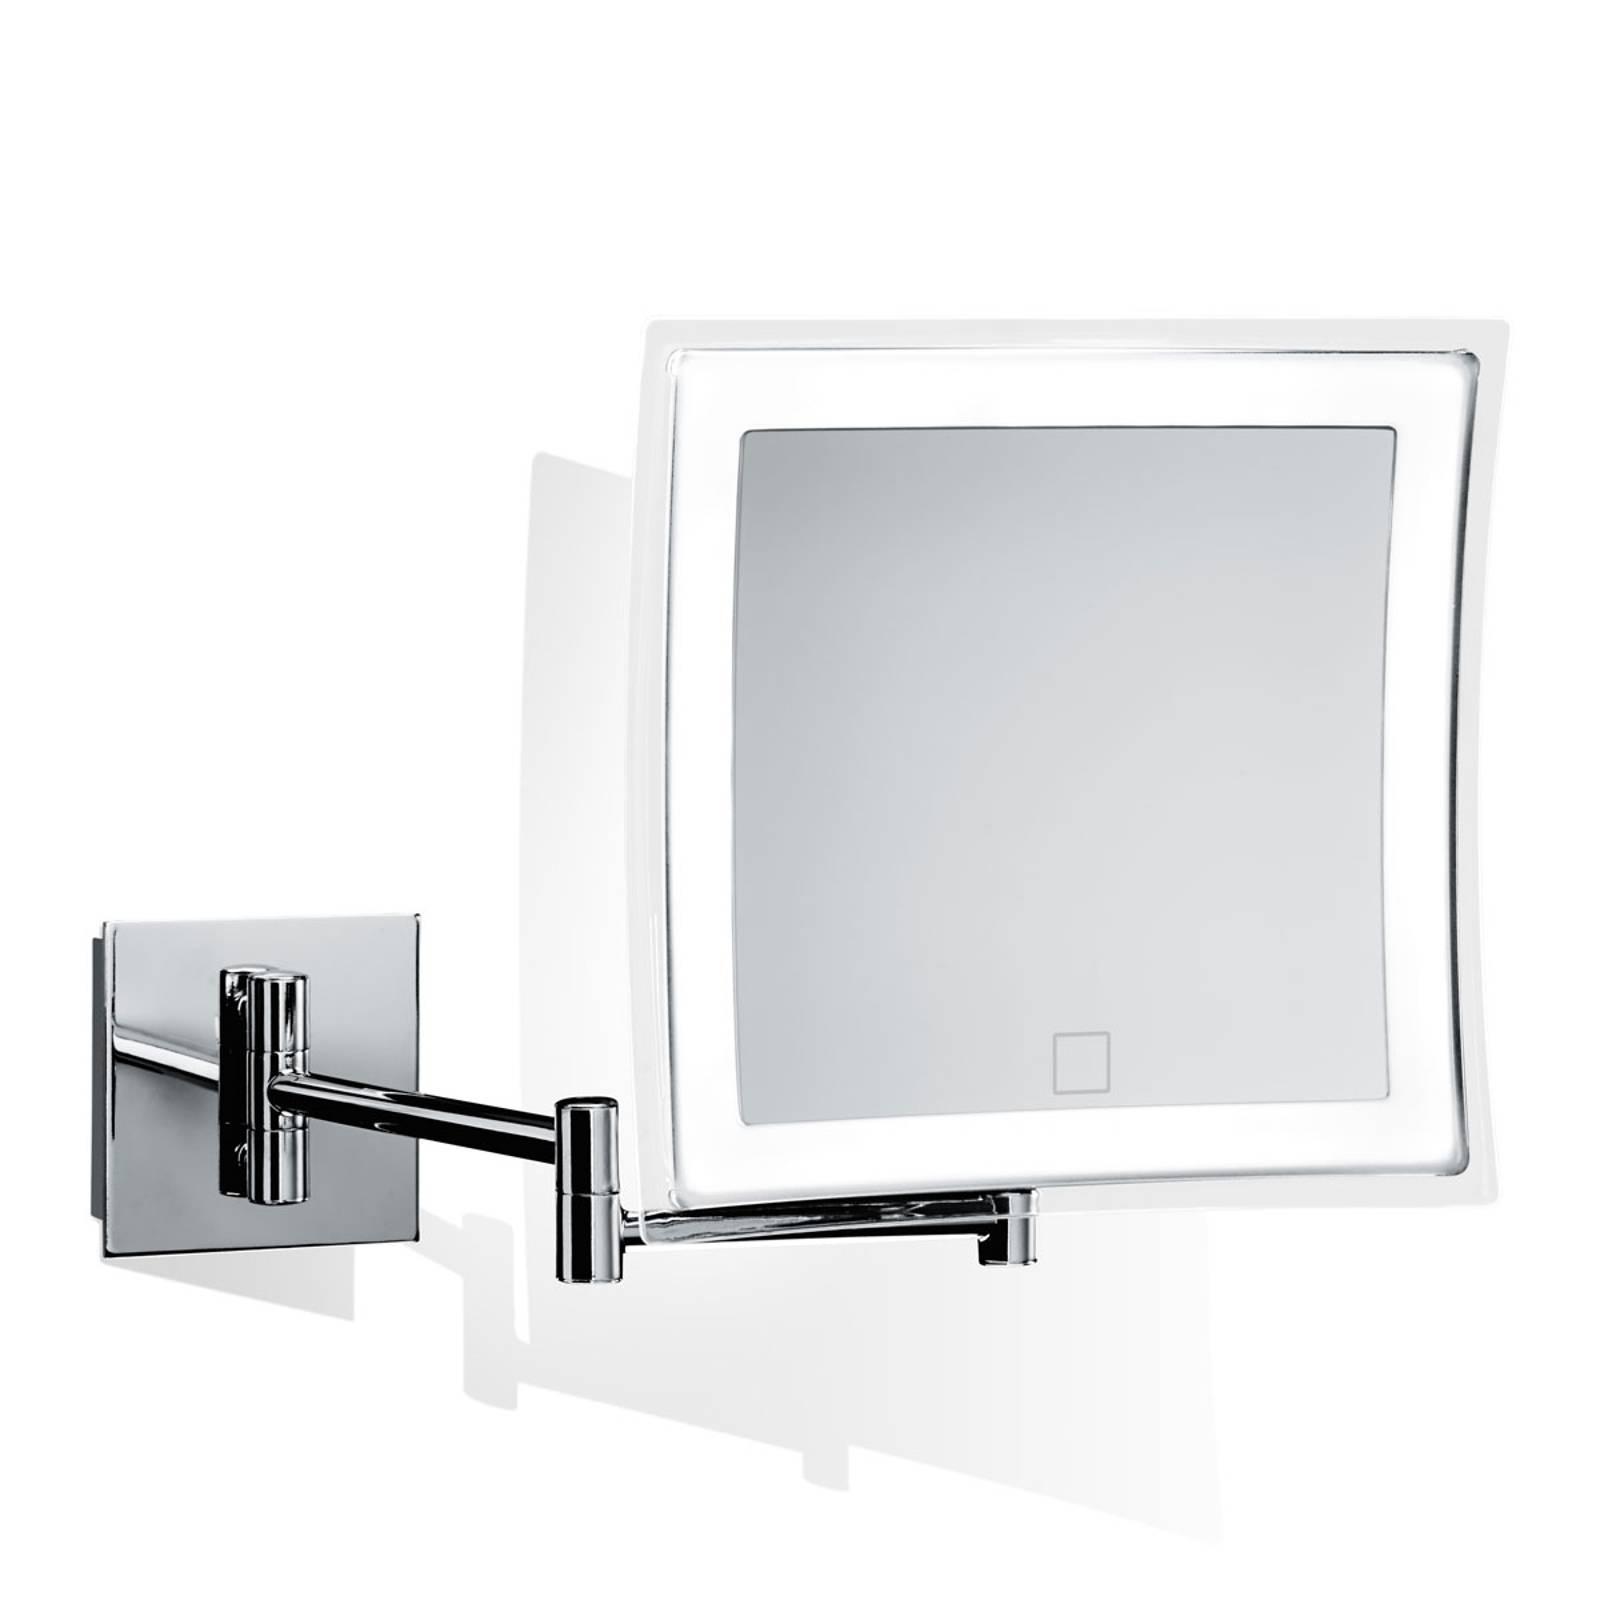 Decor Walther BS 85 Touch miroir mural LED carré